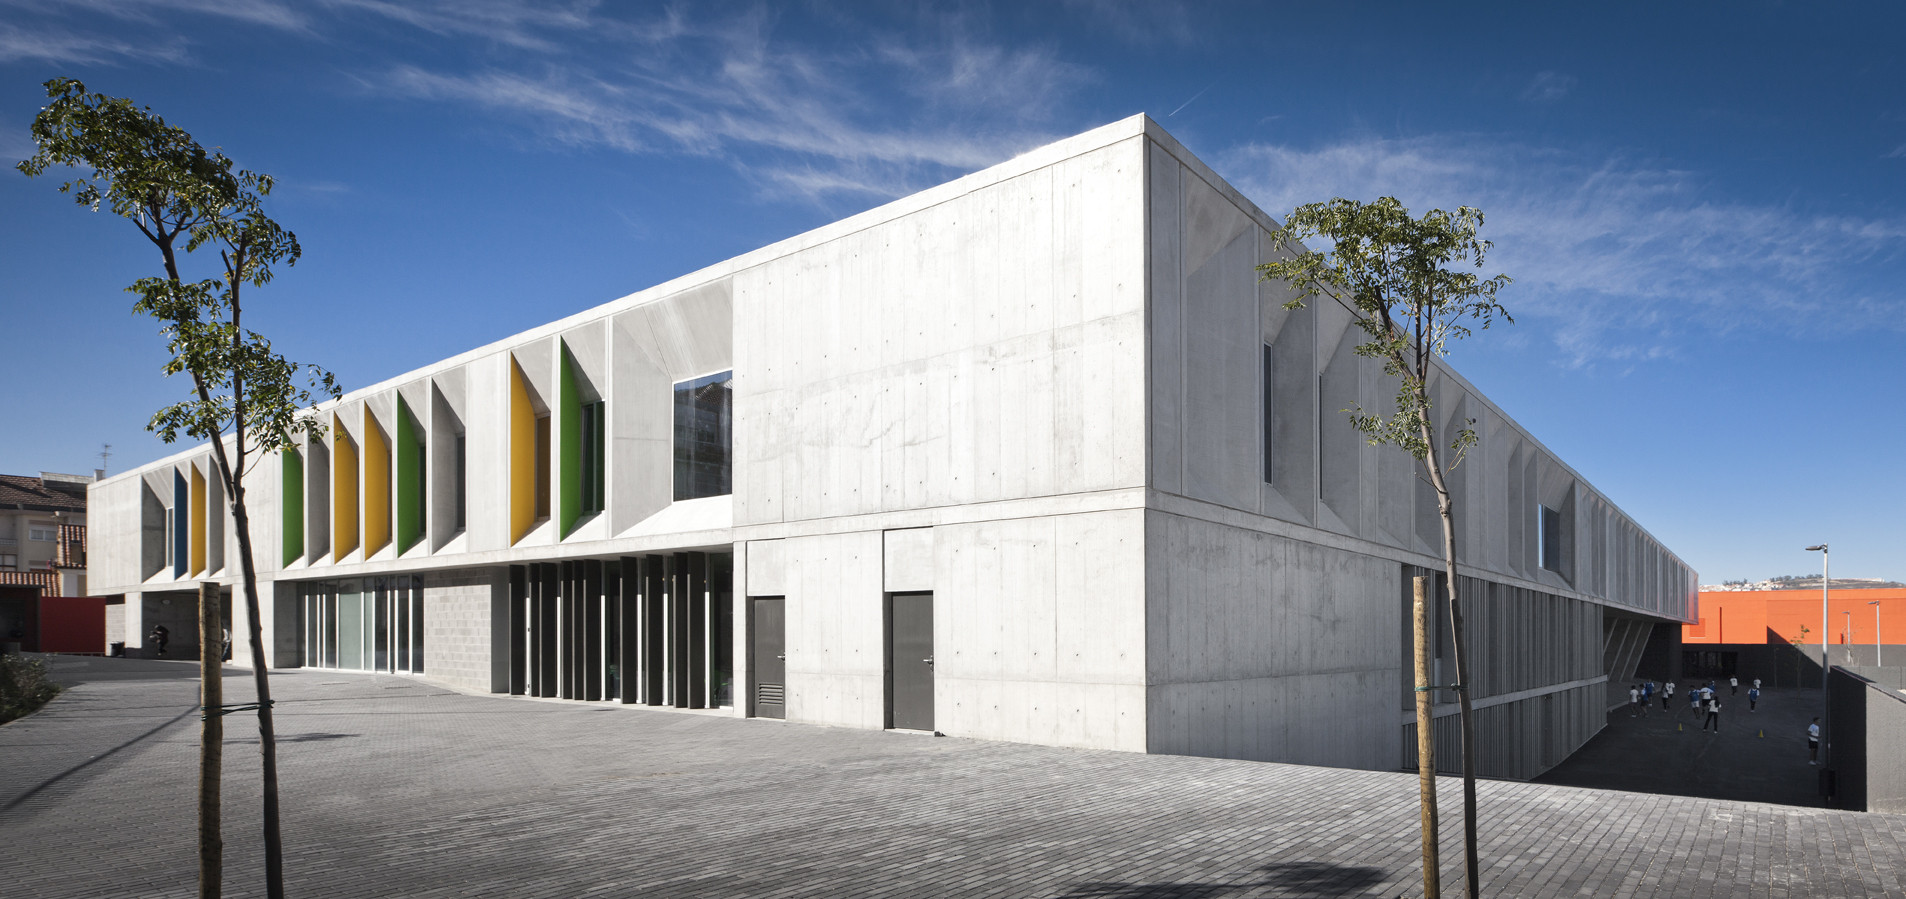 Braamcamp Freire / CVDB arquitectos, © invisiblegentleman.com